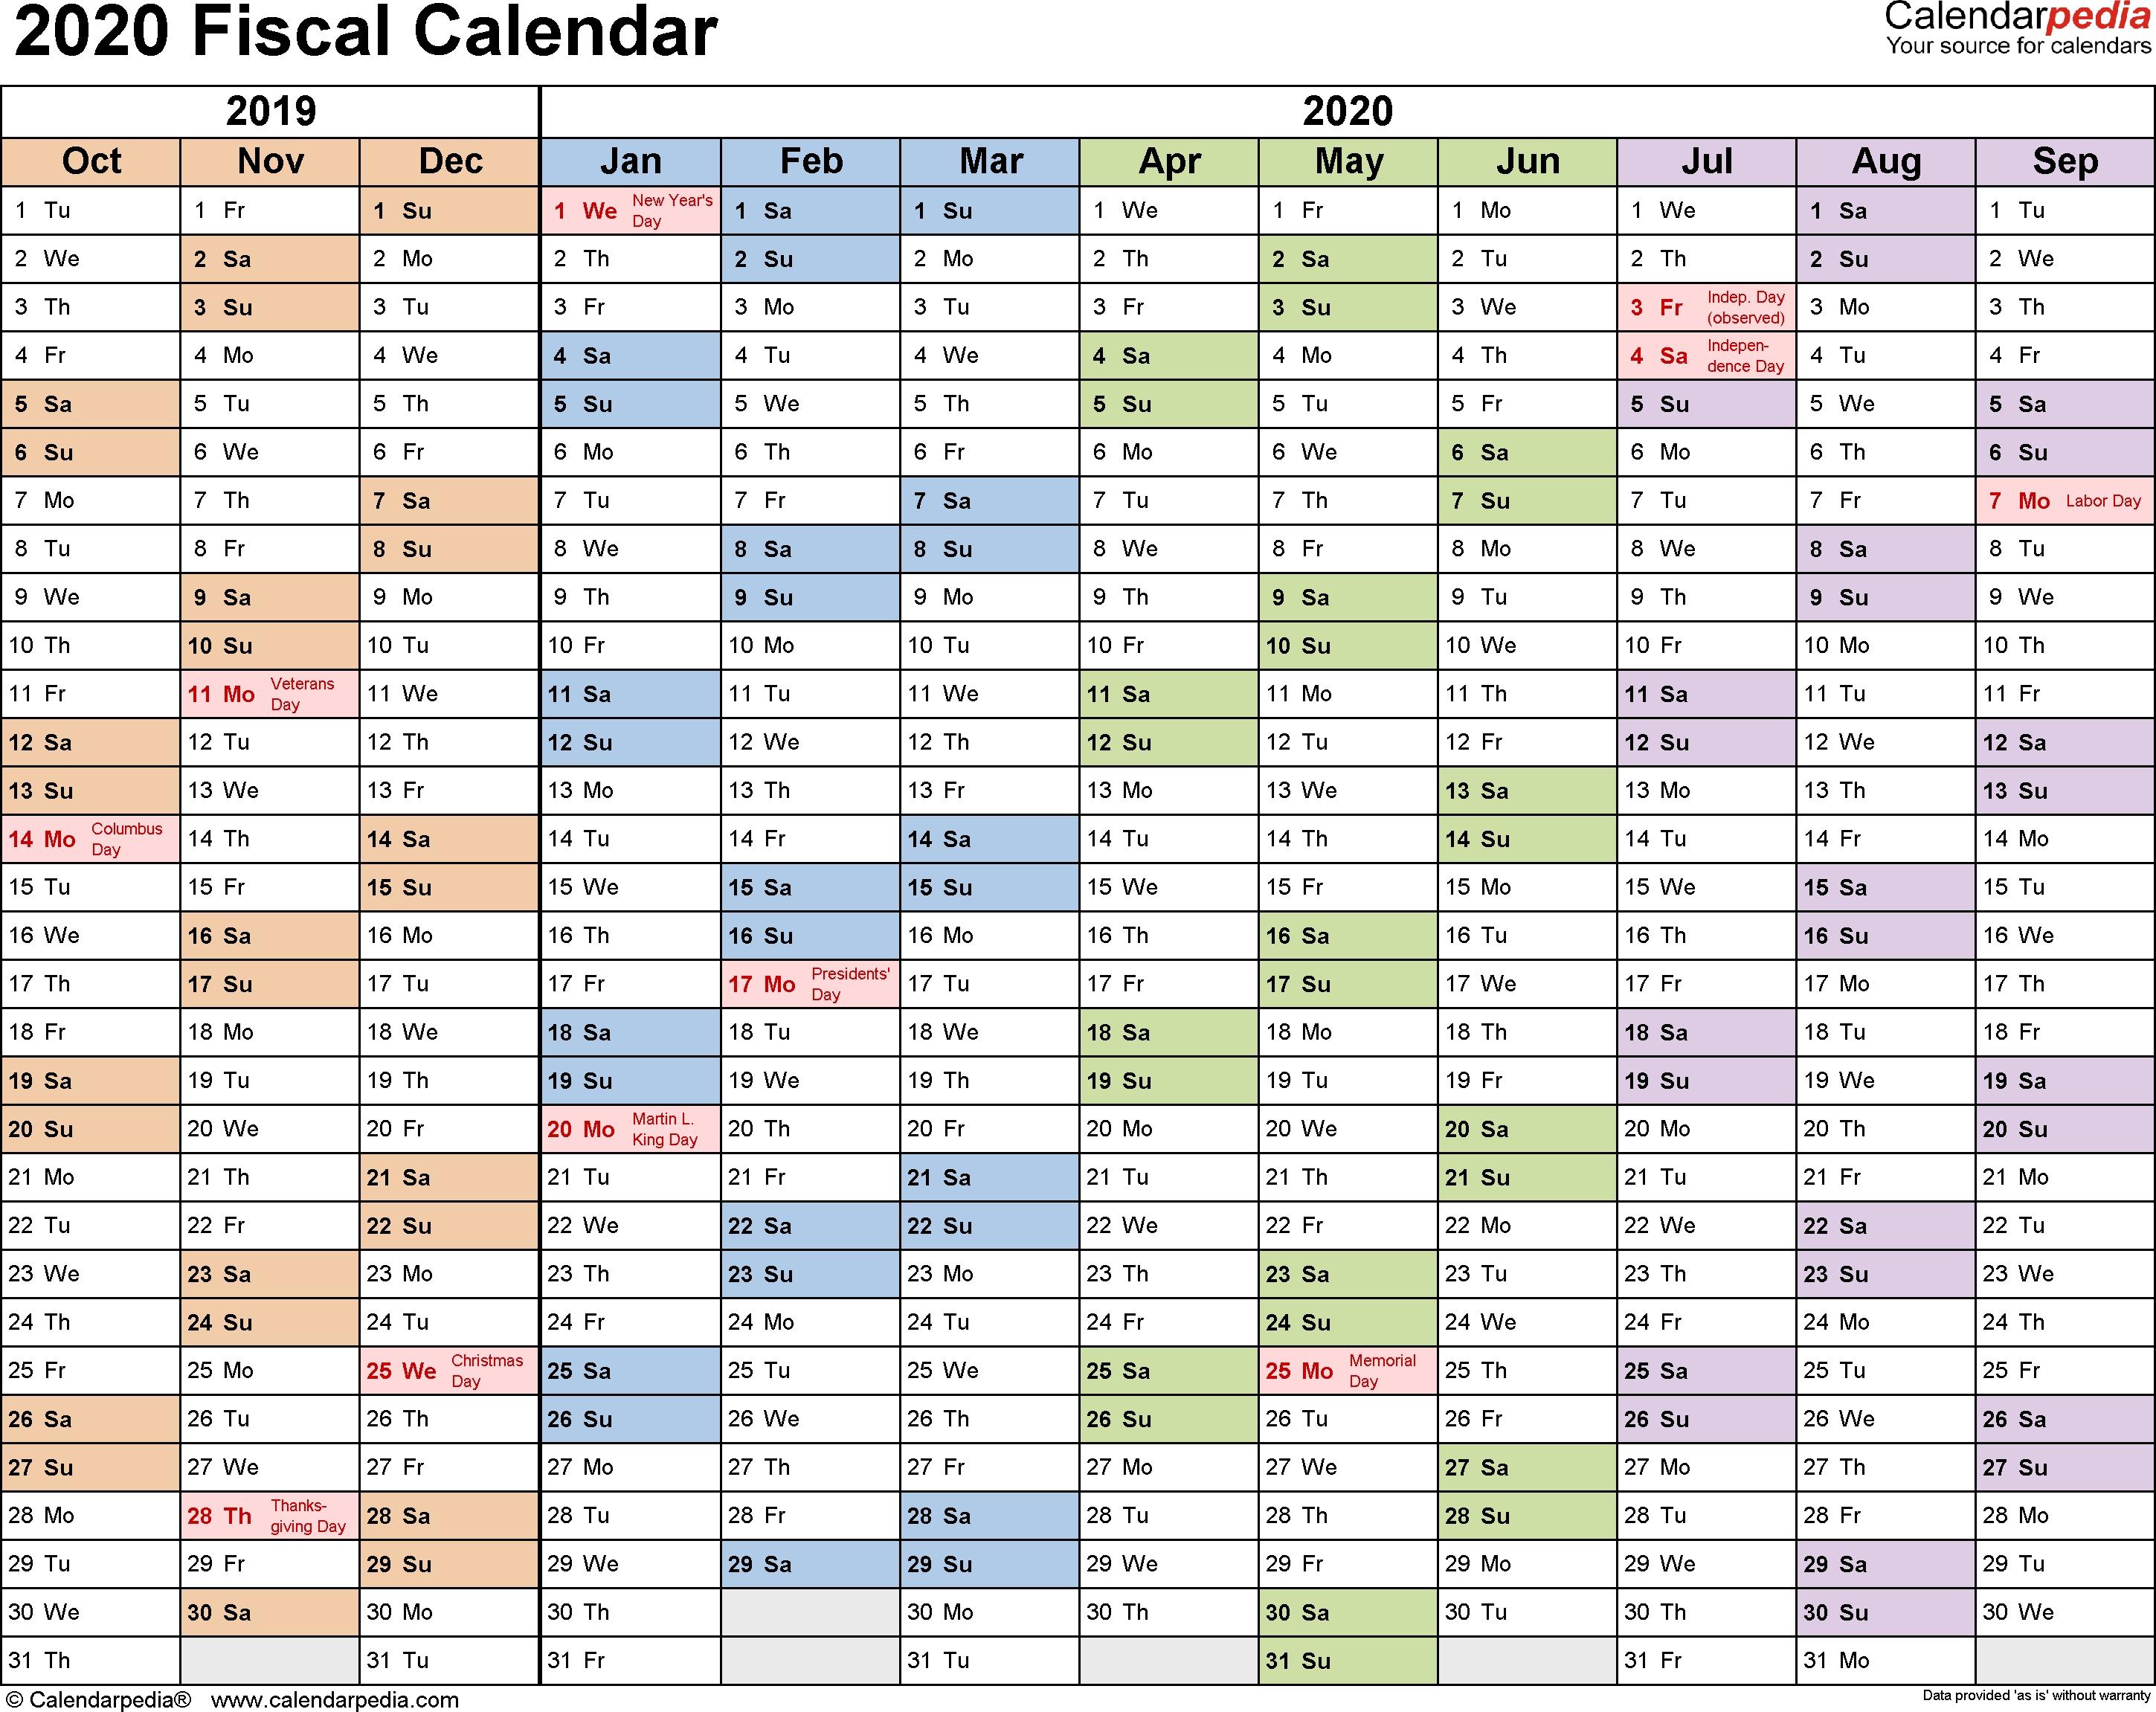 Fiscal Calendars 2020 As Free Printable Pdf Templates  Calendar Financial Year 2020 2020